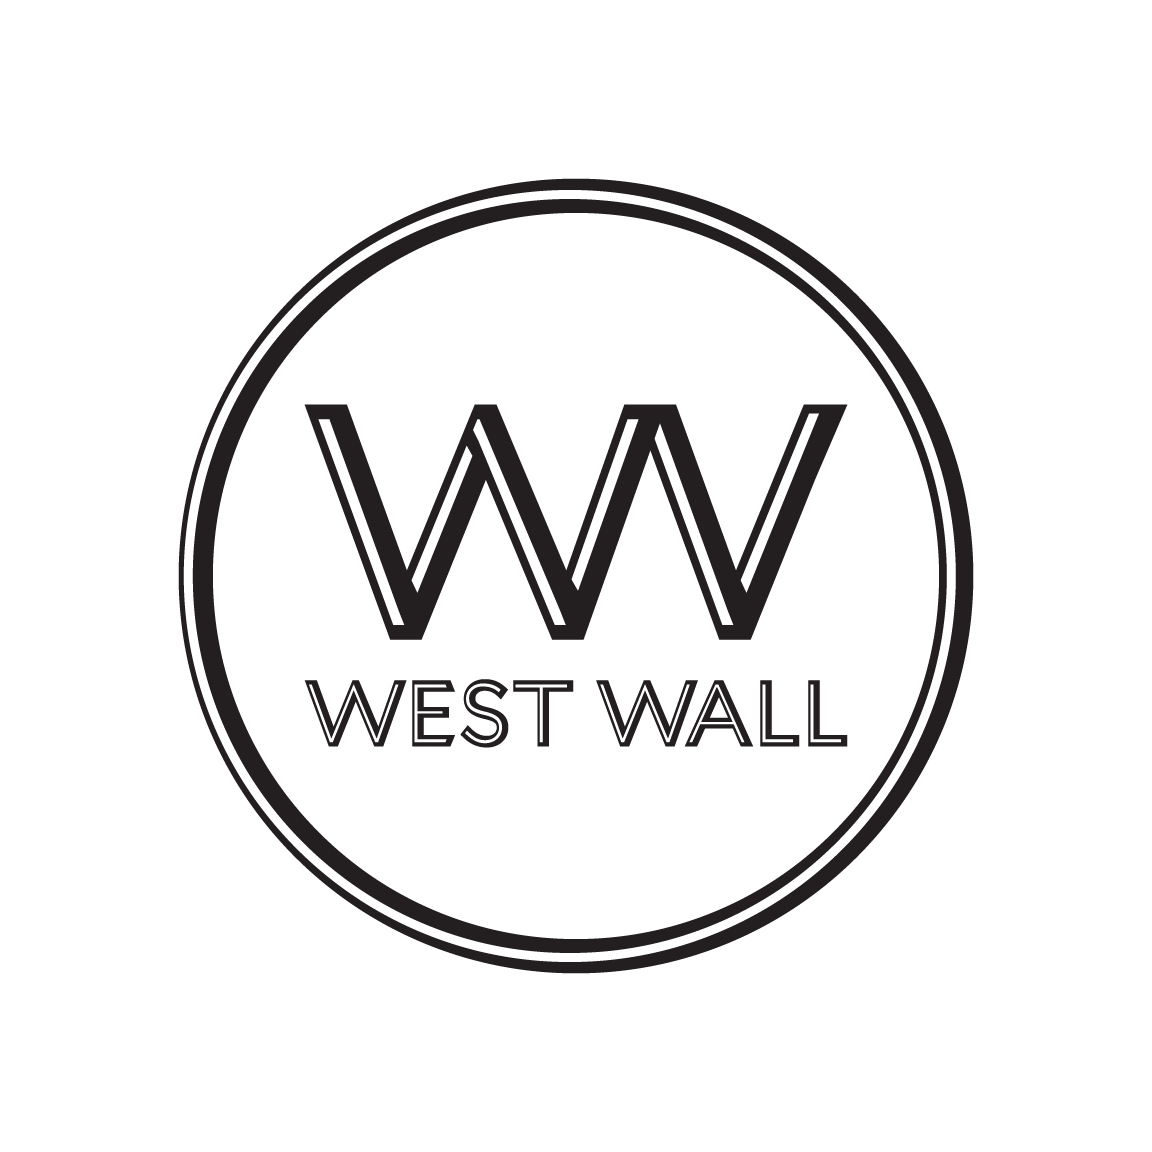 ww_logo_1color_black (1) (1).png